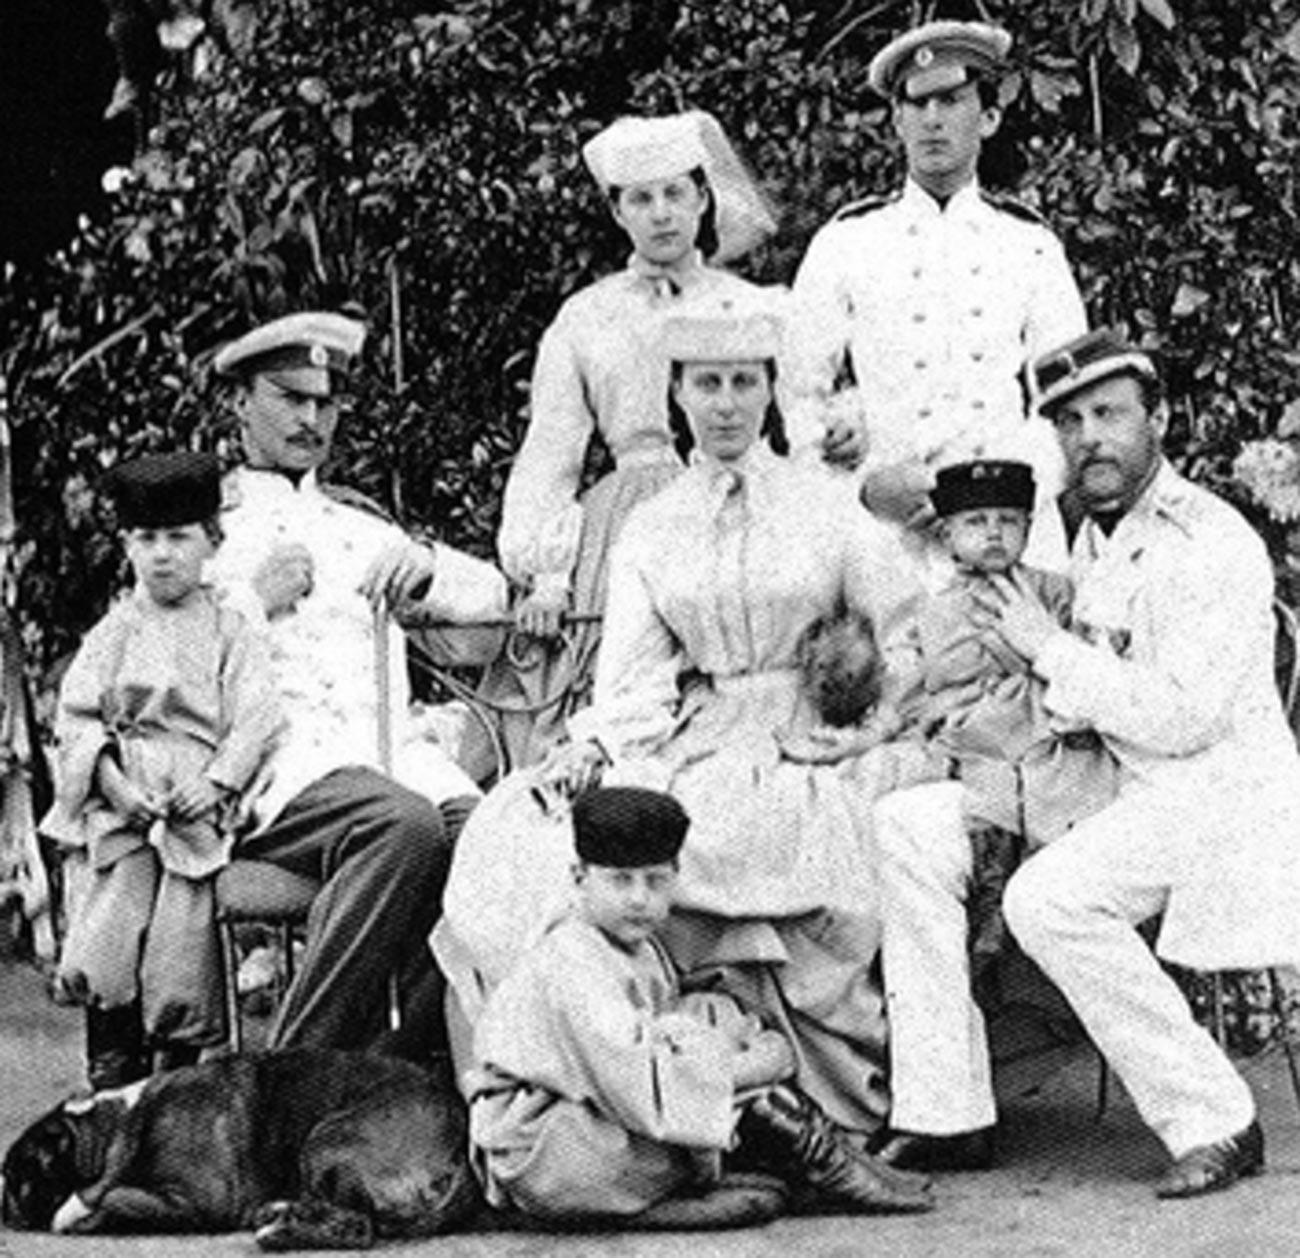 Grand Duke Konstantin Nikolaievich and his family